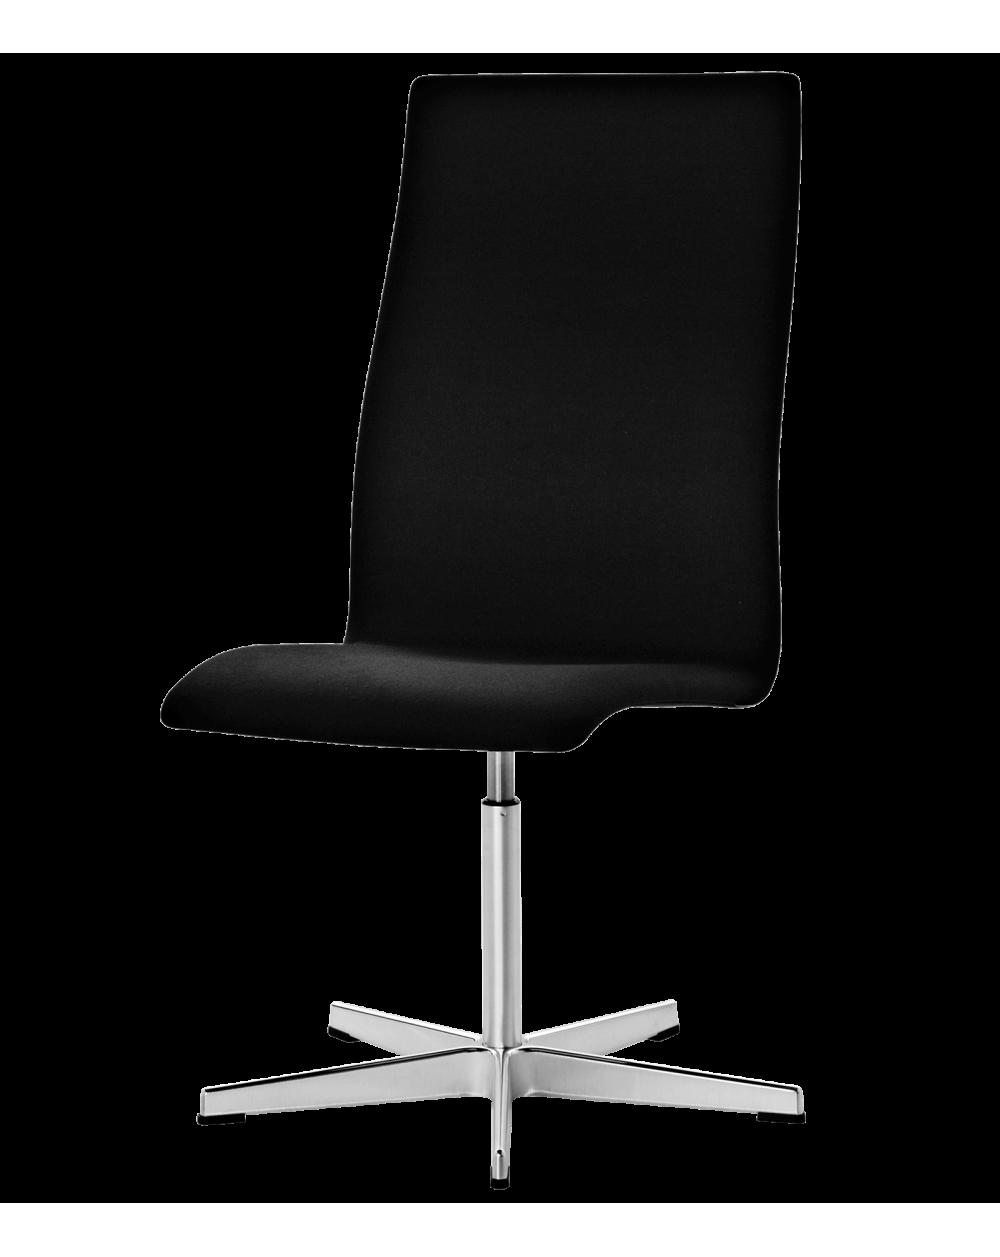 Oxford chair, Arne Jacobsen